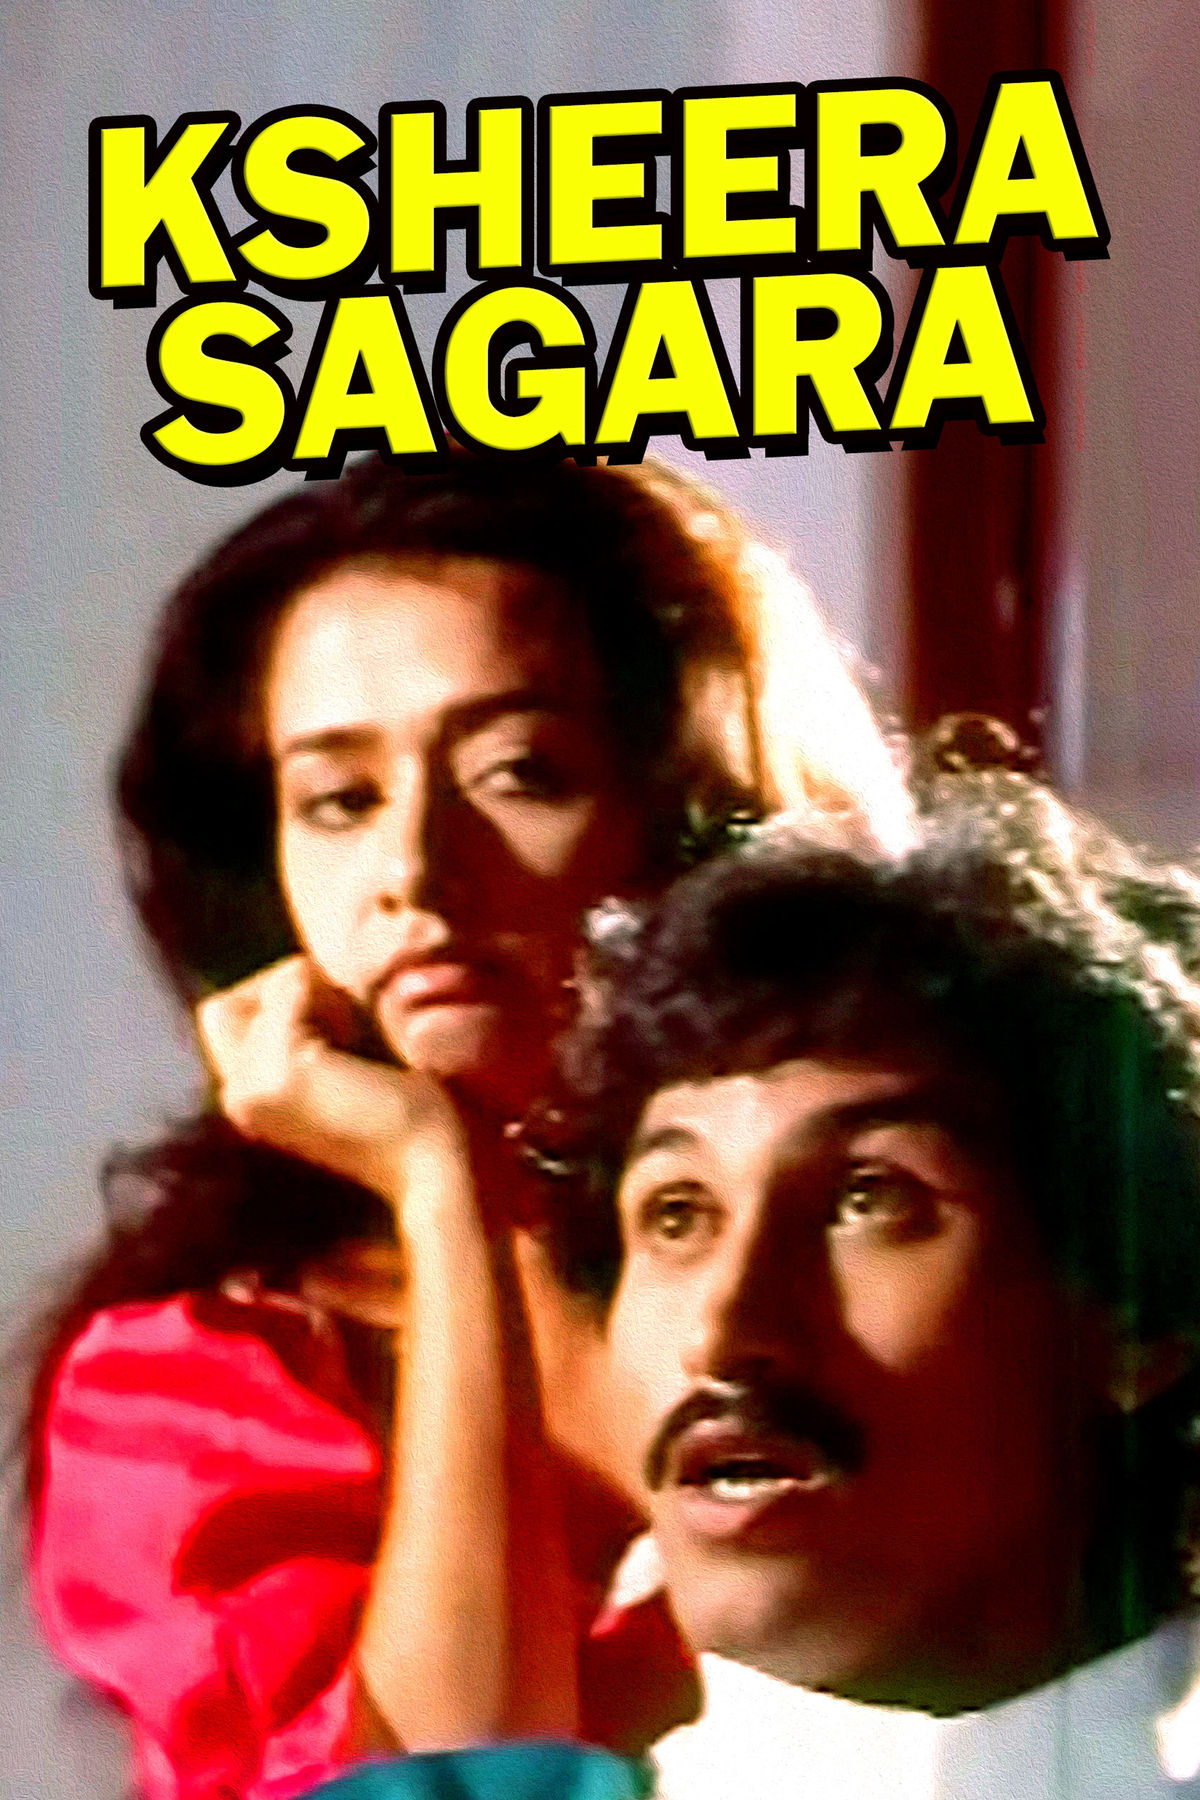 Ksheera Sagara